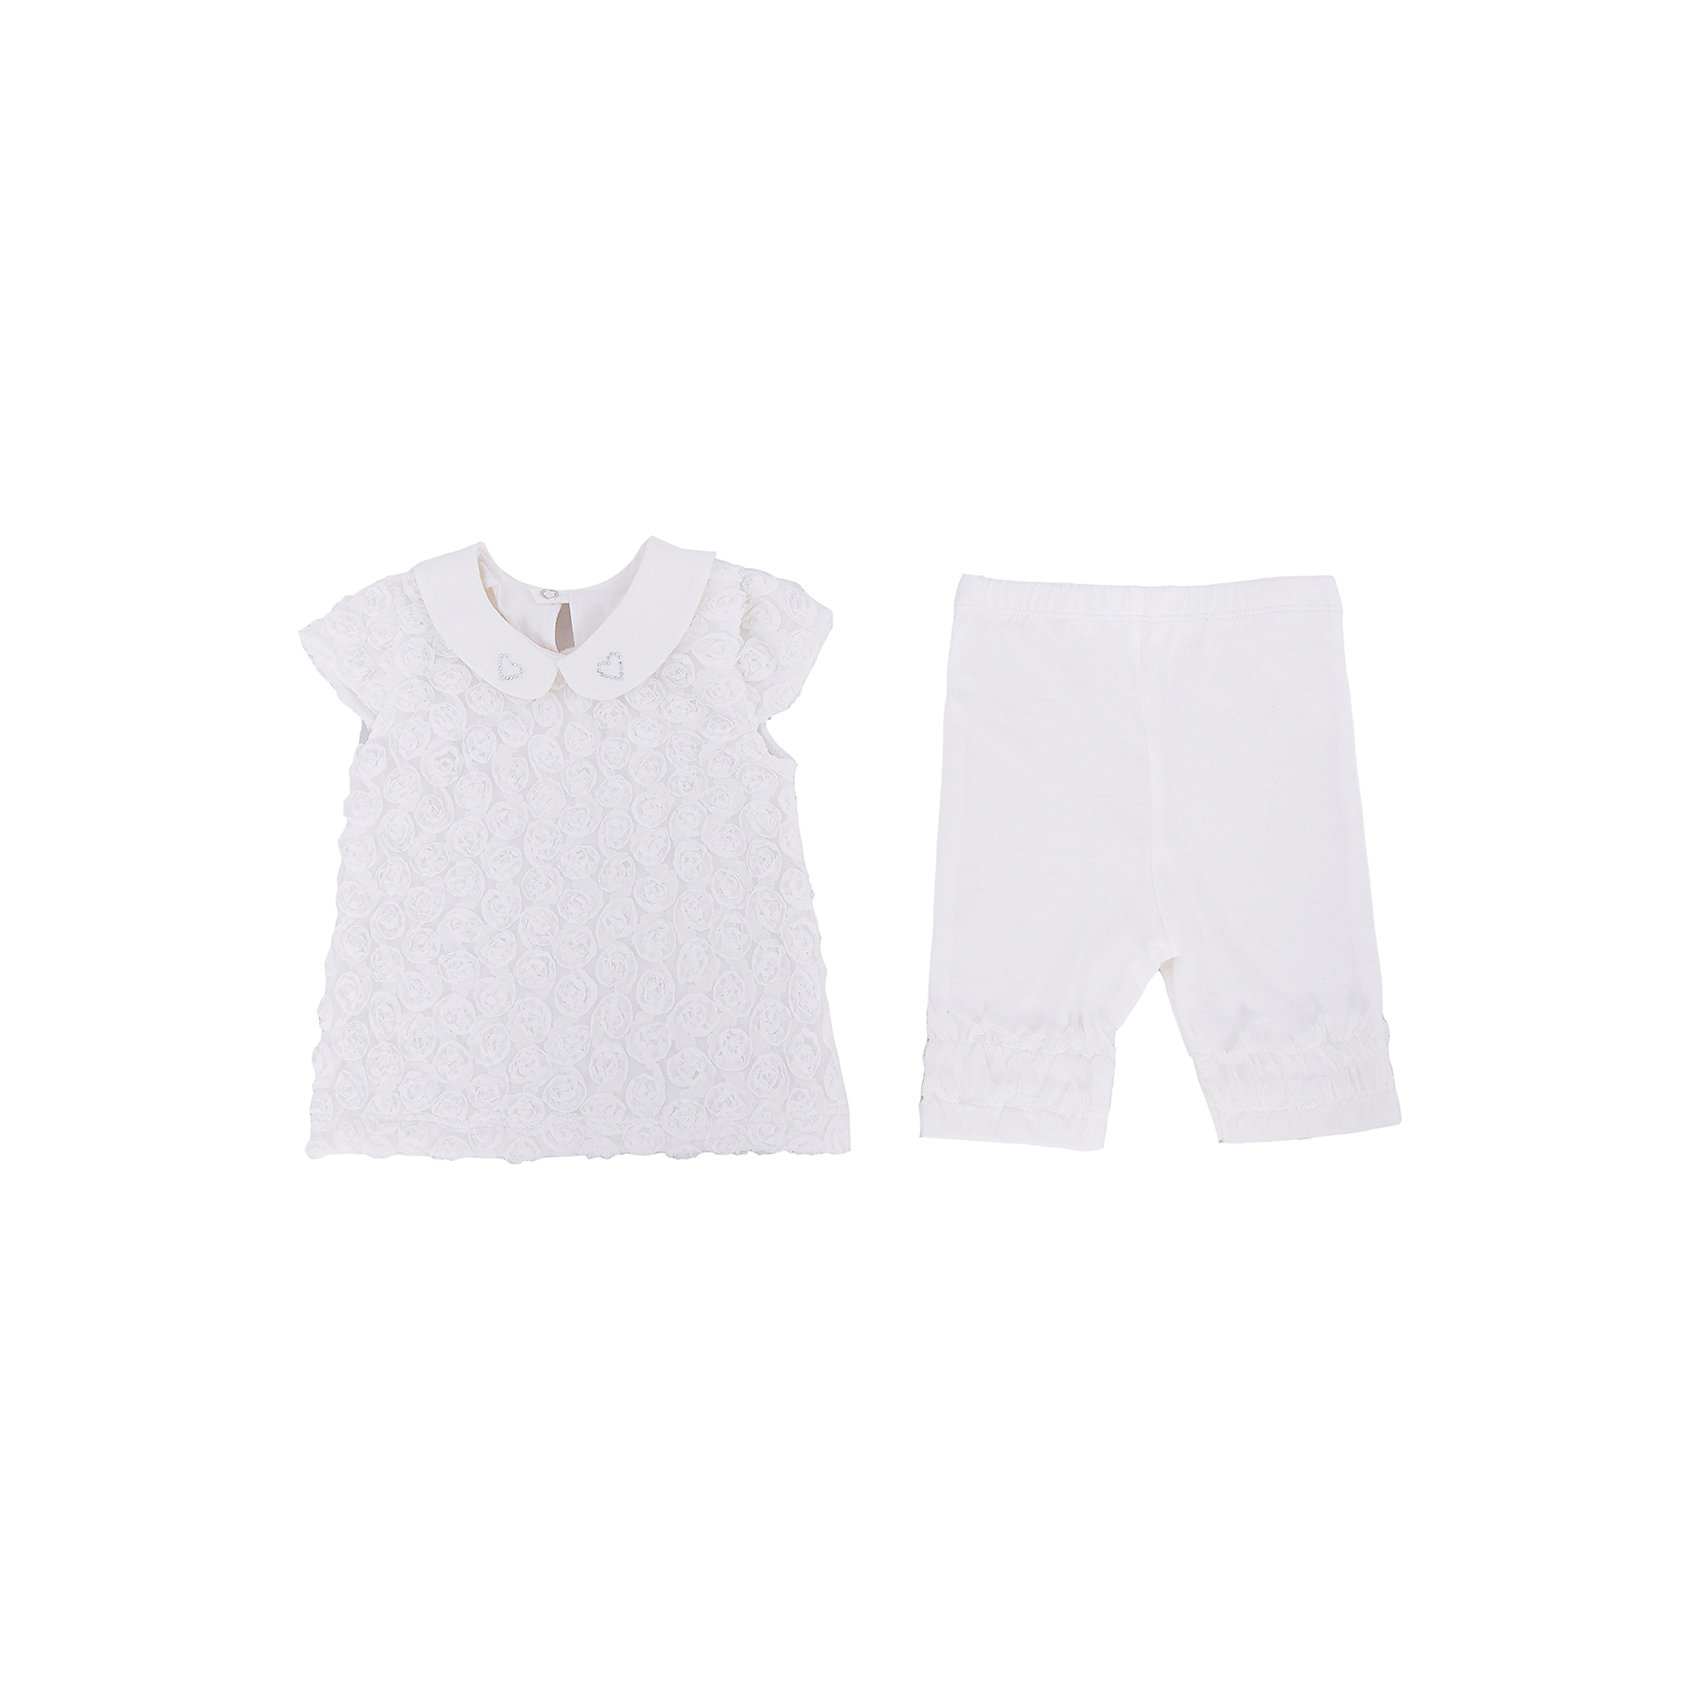 Soni Kids Комплект: футболка и бриджи для девочки Soni Kids soni kids бриджи